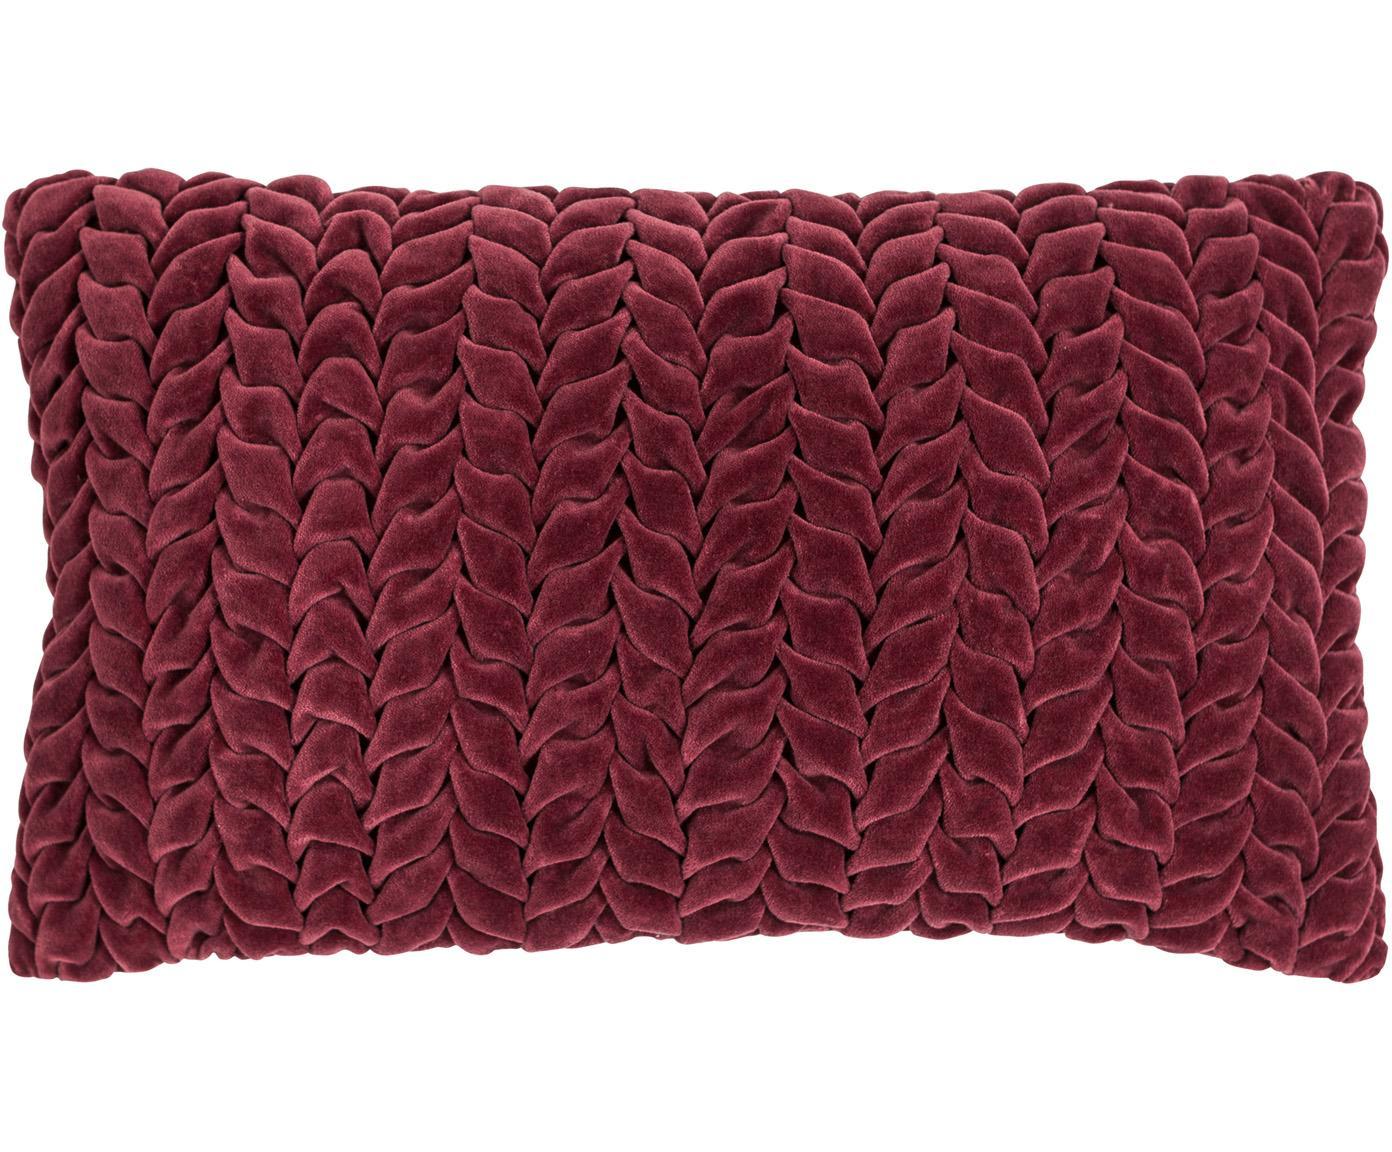 Cojín de terciopelo Smock, con relleno, Funda: 100%terciopelo de algodó, Color vino, An 30 x L 50 cm